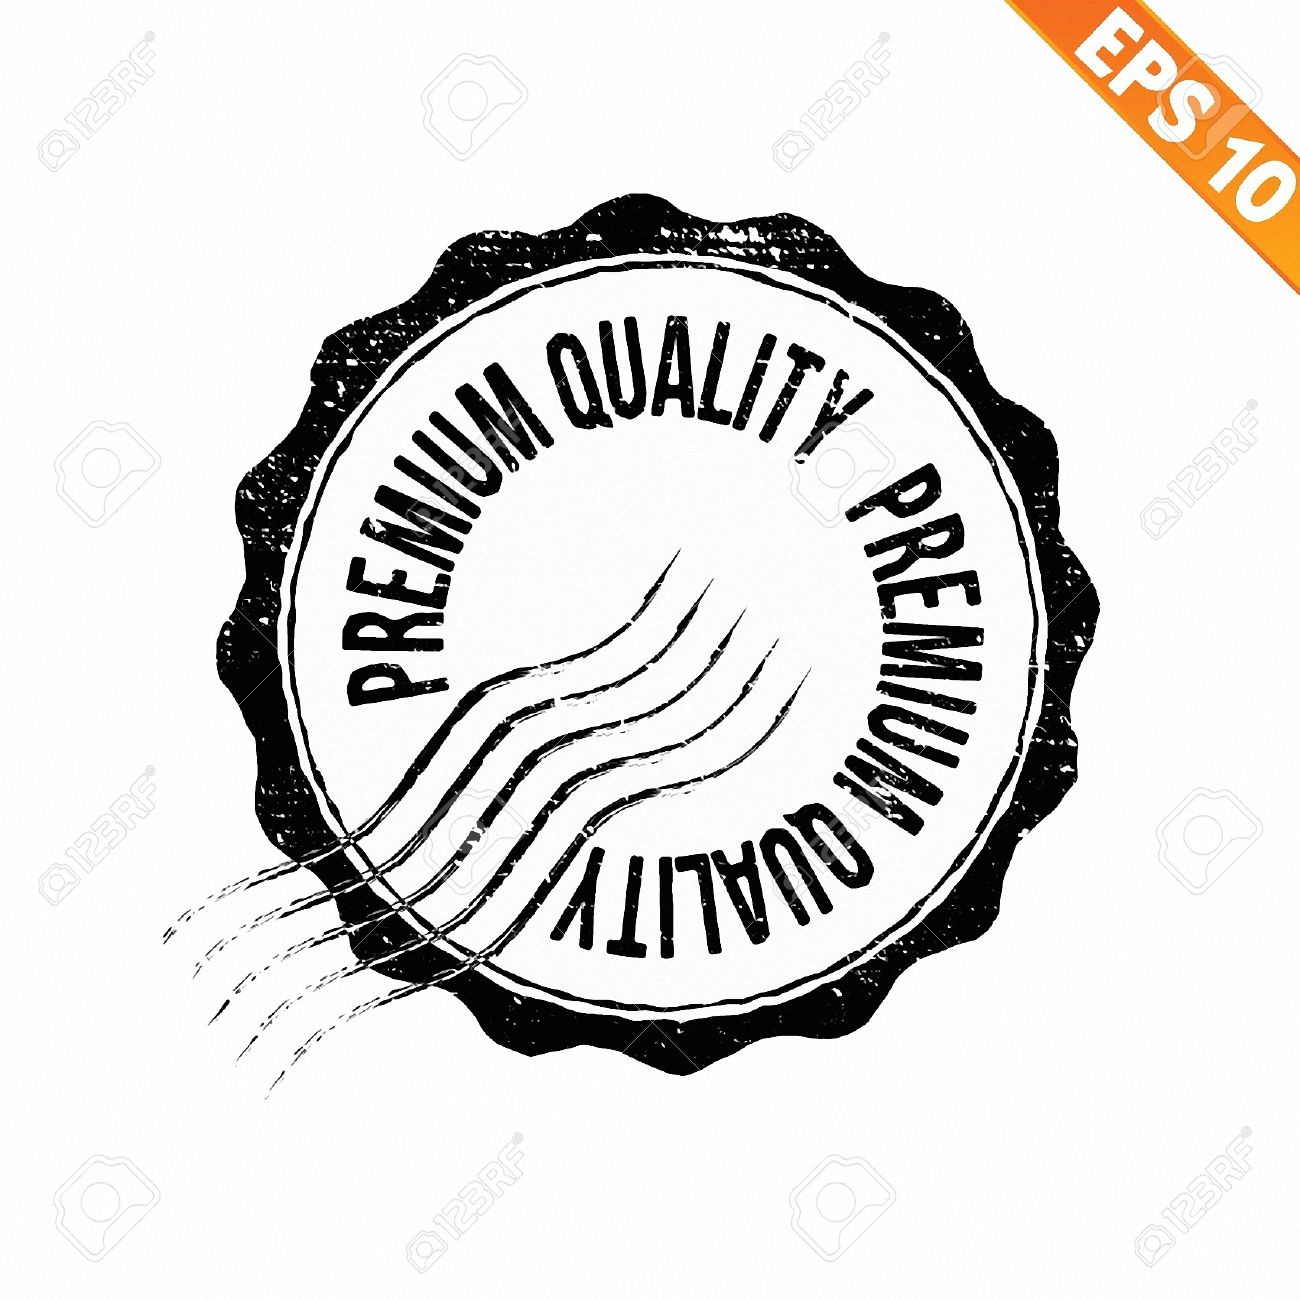 grunge highest quality guarantee rubber stamp vector illustration rh 123rf com grunge vector free download grunge vector backgrounds